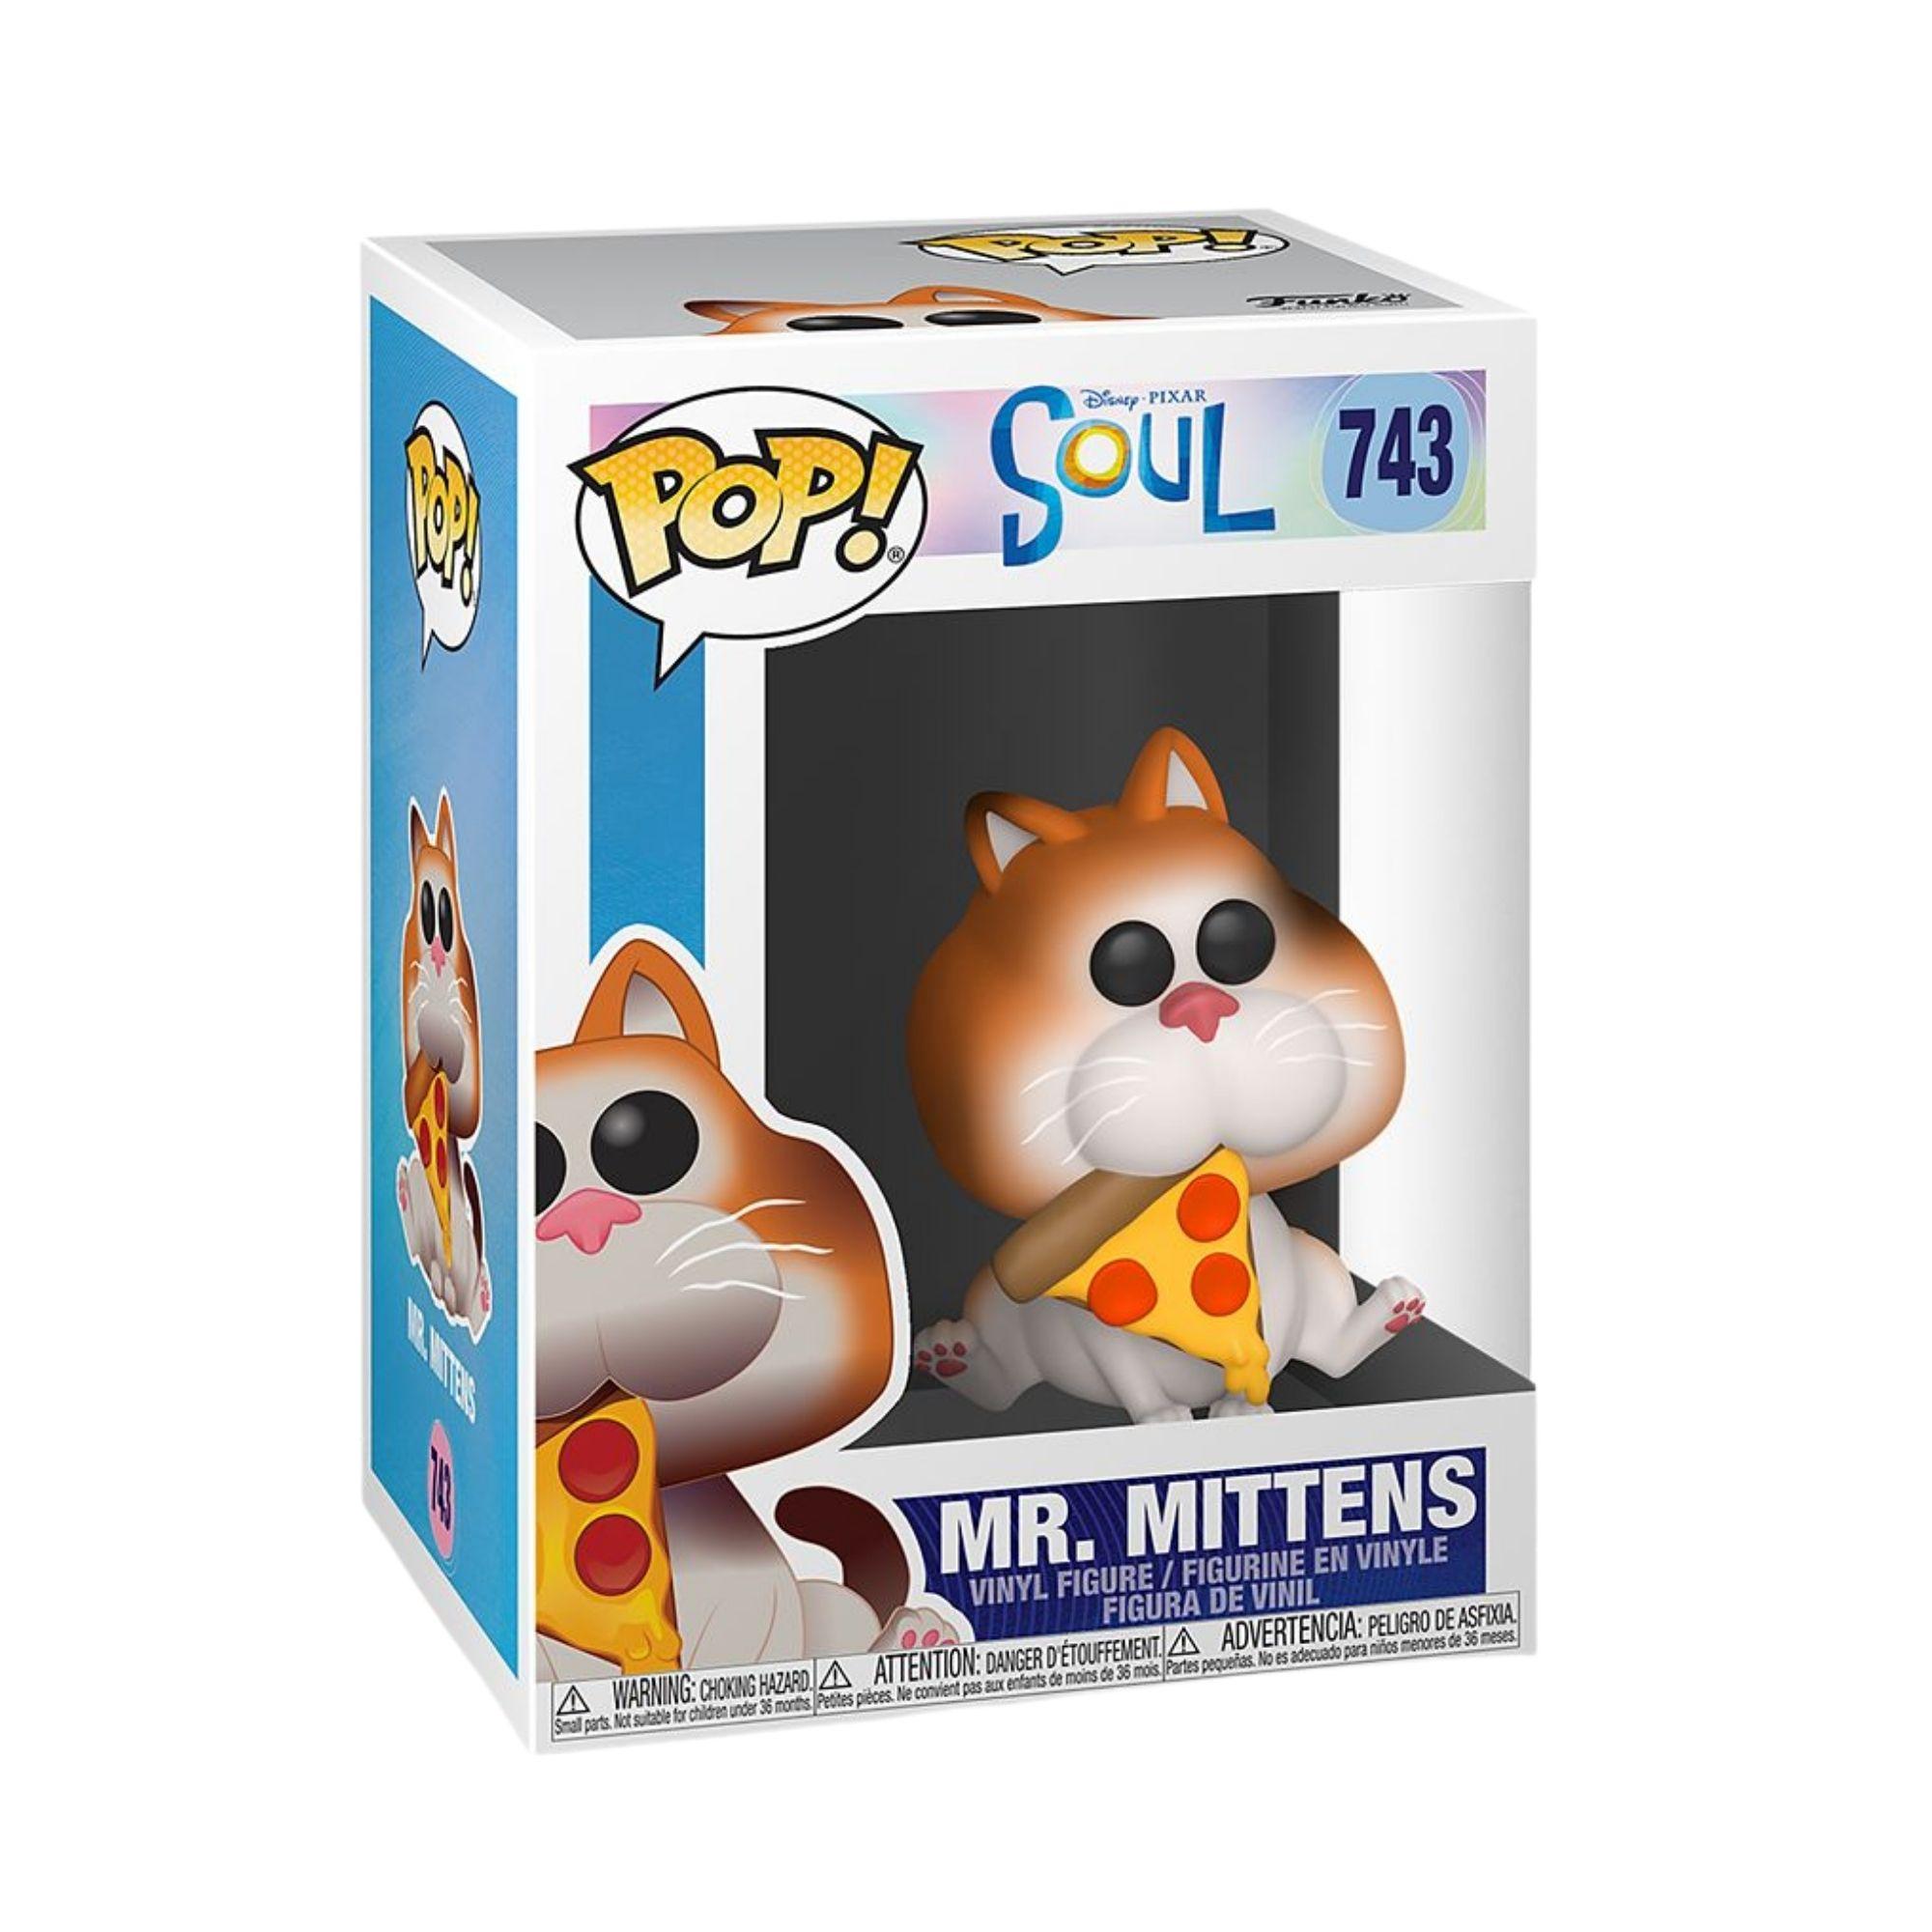 Funko Pop Disney Pixar Soul Mr. Mittens #743  - Game Land Brinquedos